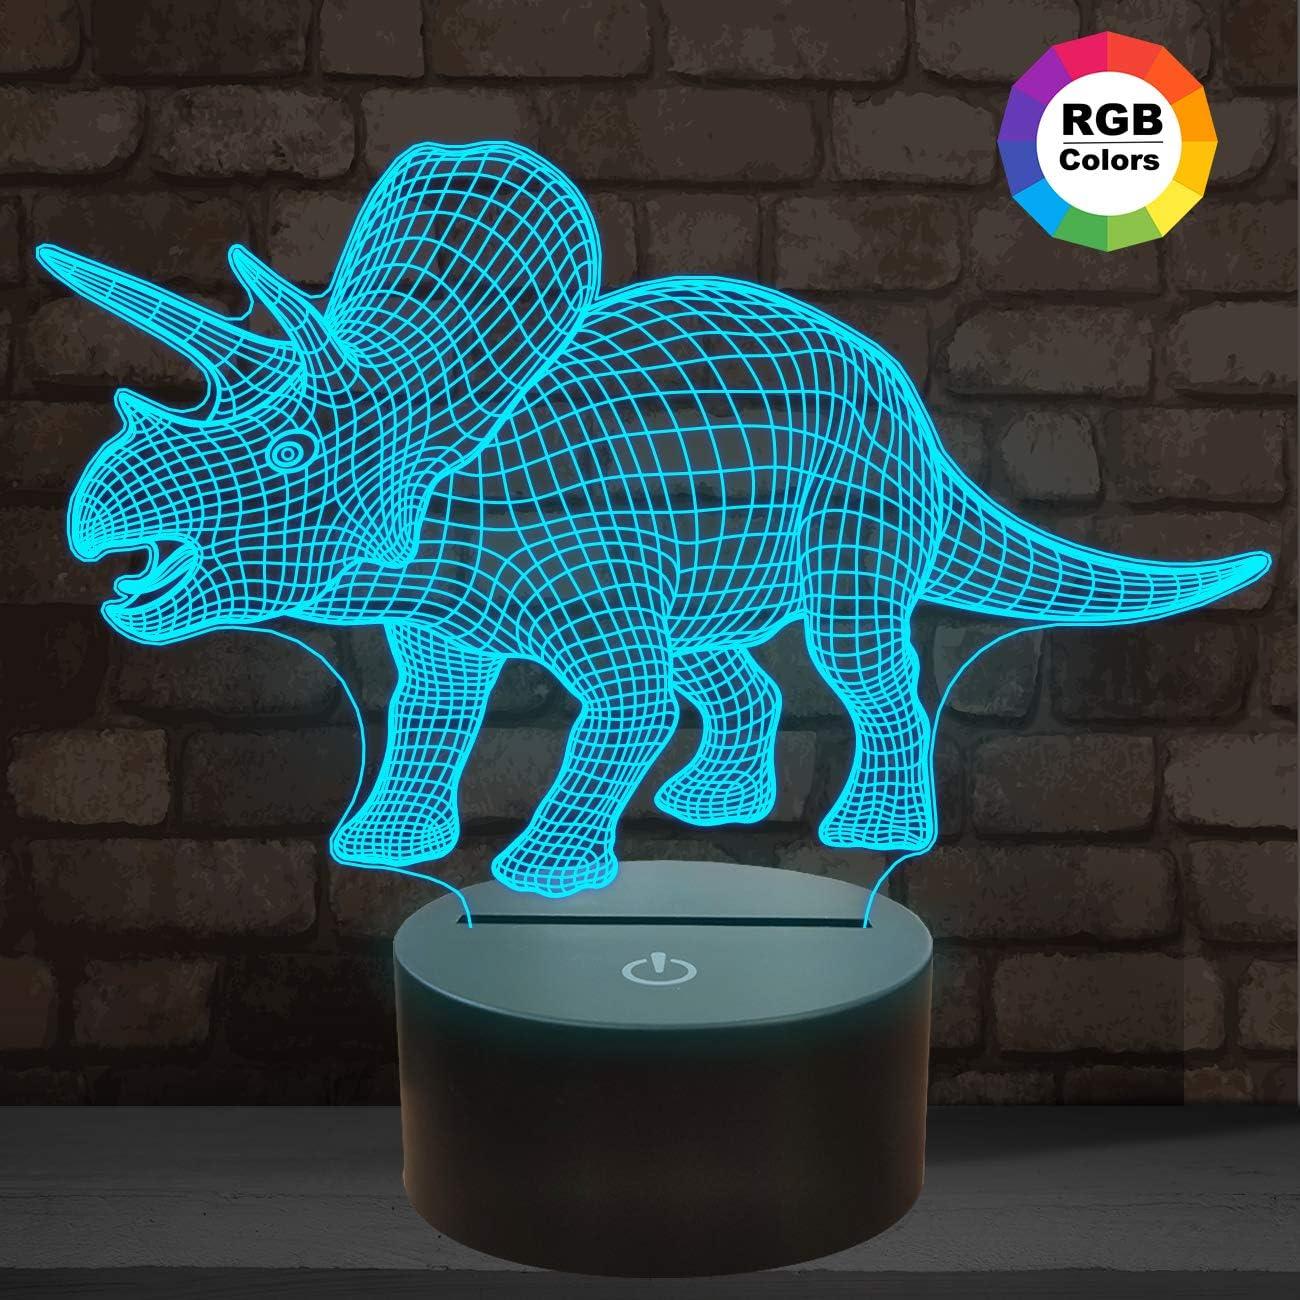 Dinosaur 3D Night Light, Triceratops 3D Illusion Lamp, 7 Colors Optical USB LED Touch Table Desk Nightlight, Christmas Gift for Kids Boys & Girls